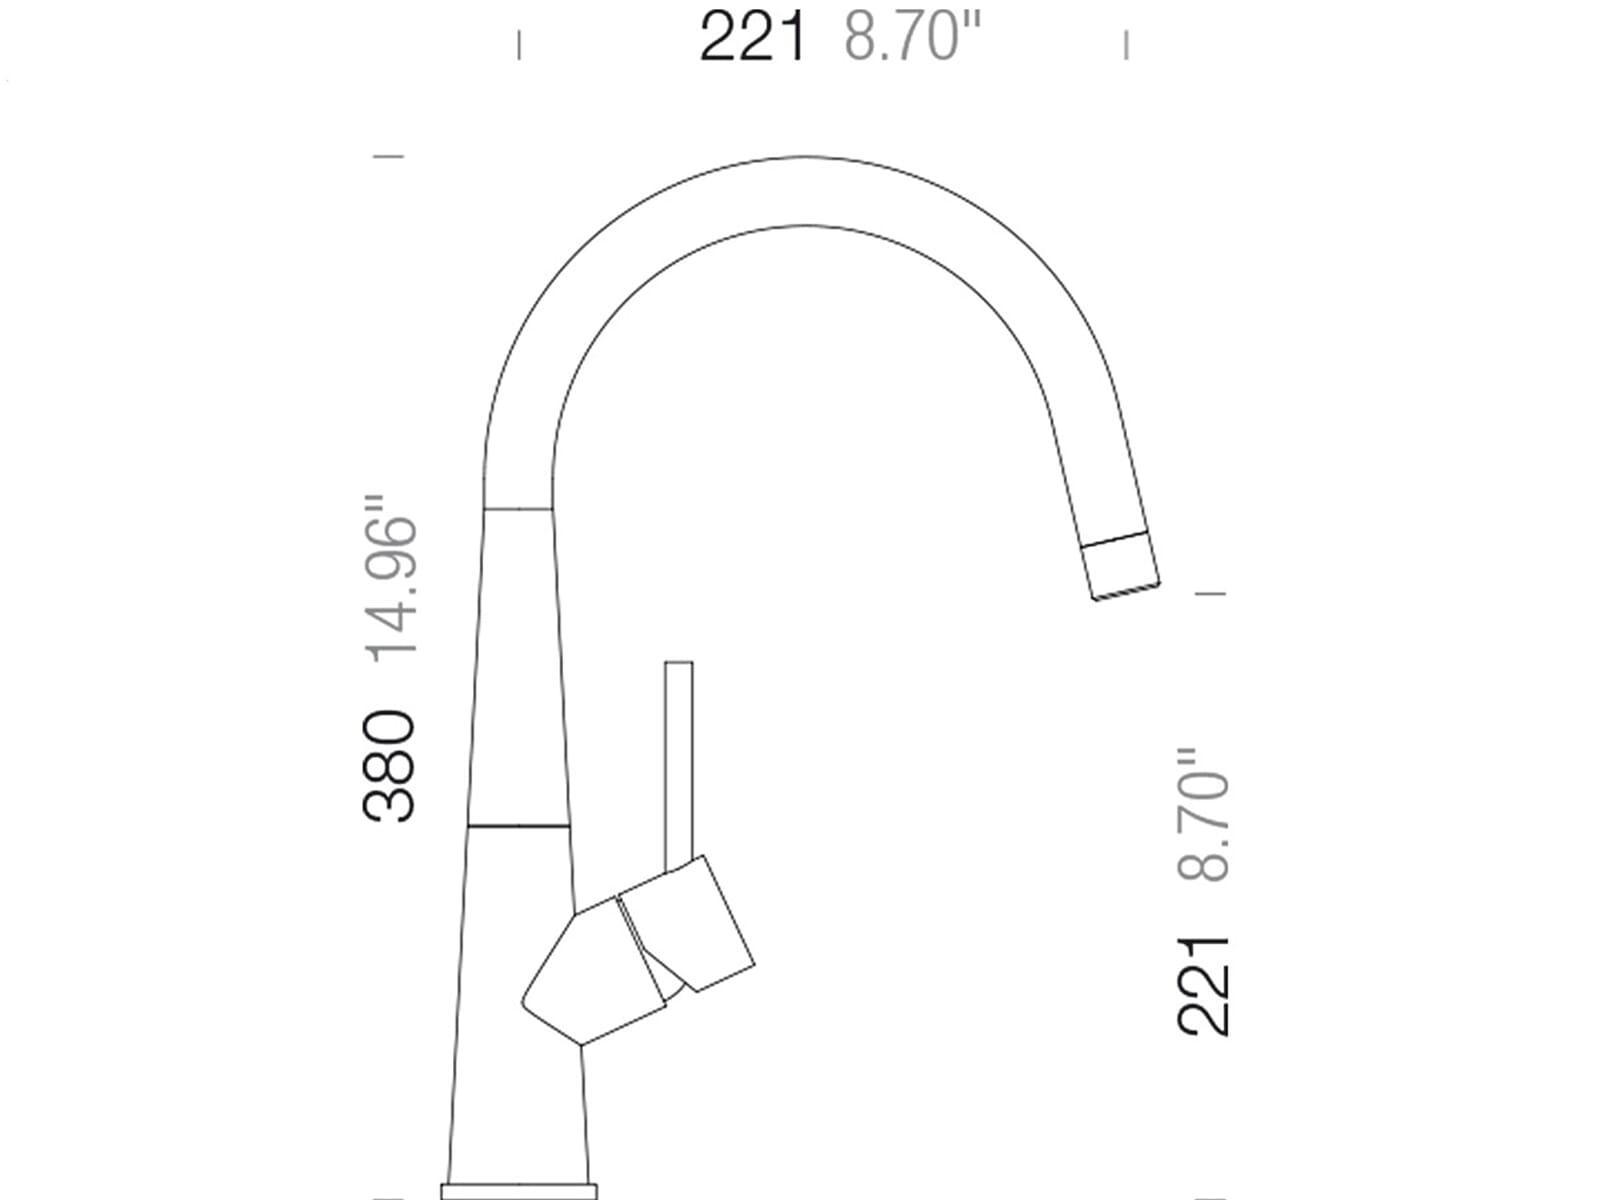 schock conos in edelstahl massiv hochdruckarmatur ebay. Black Bedroom Furniture Sets. Home Design Ideas